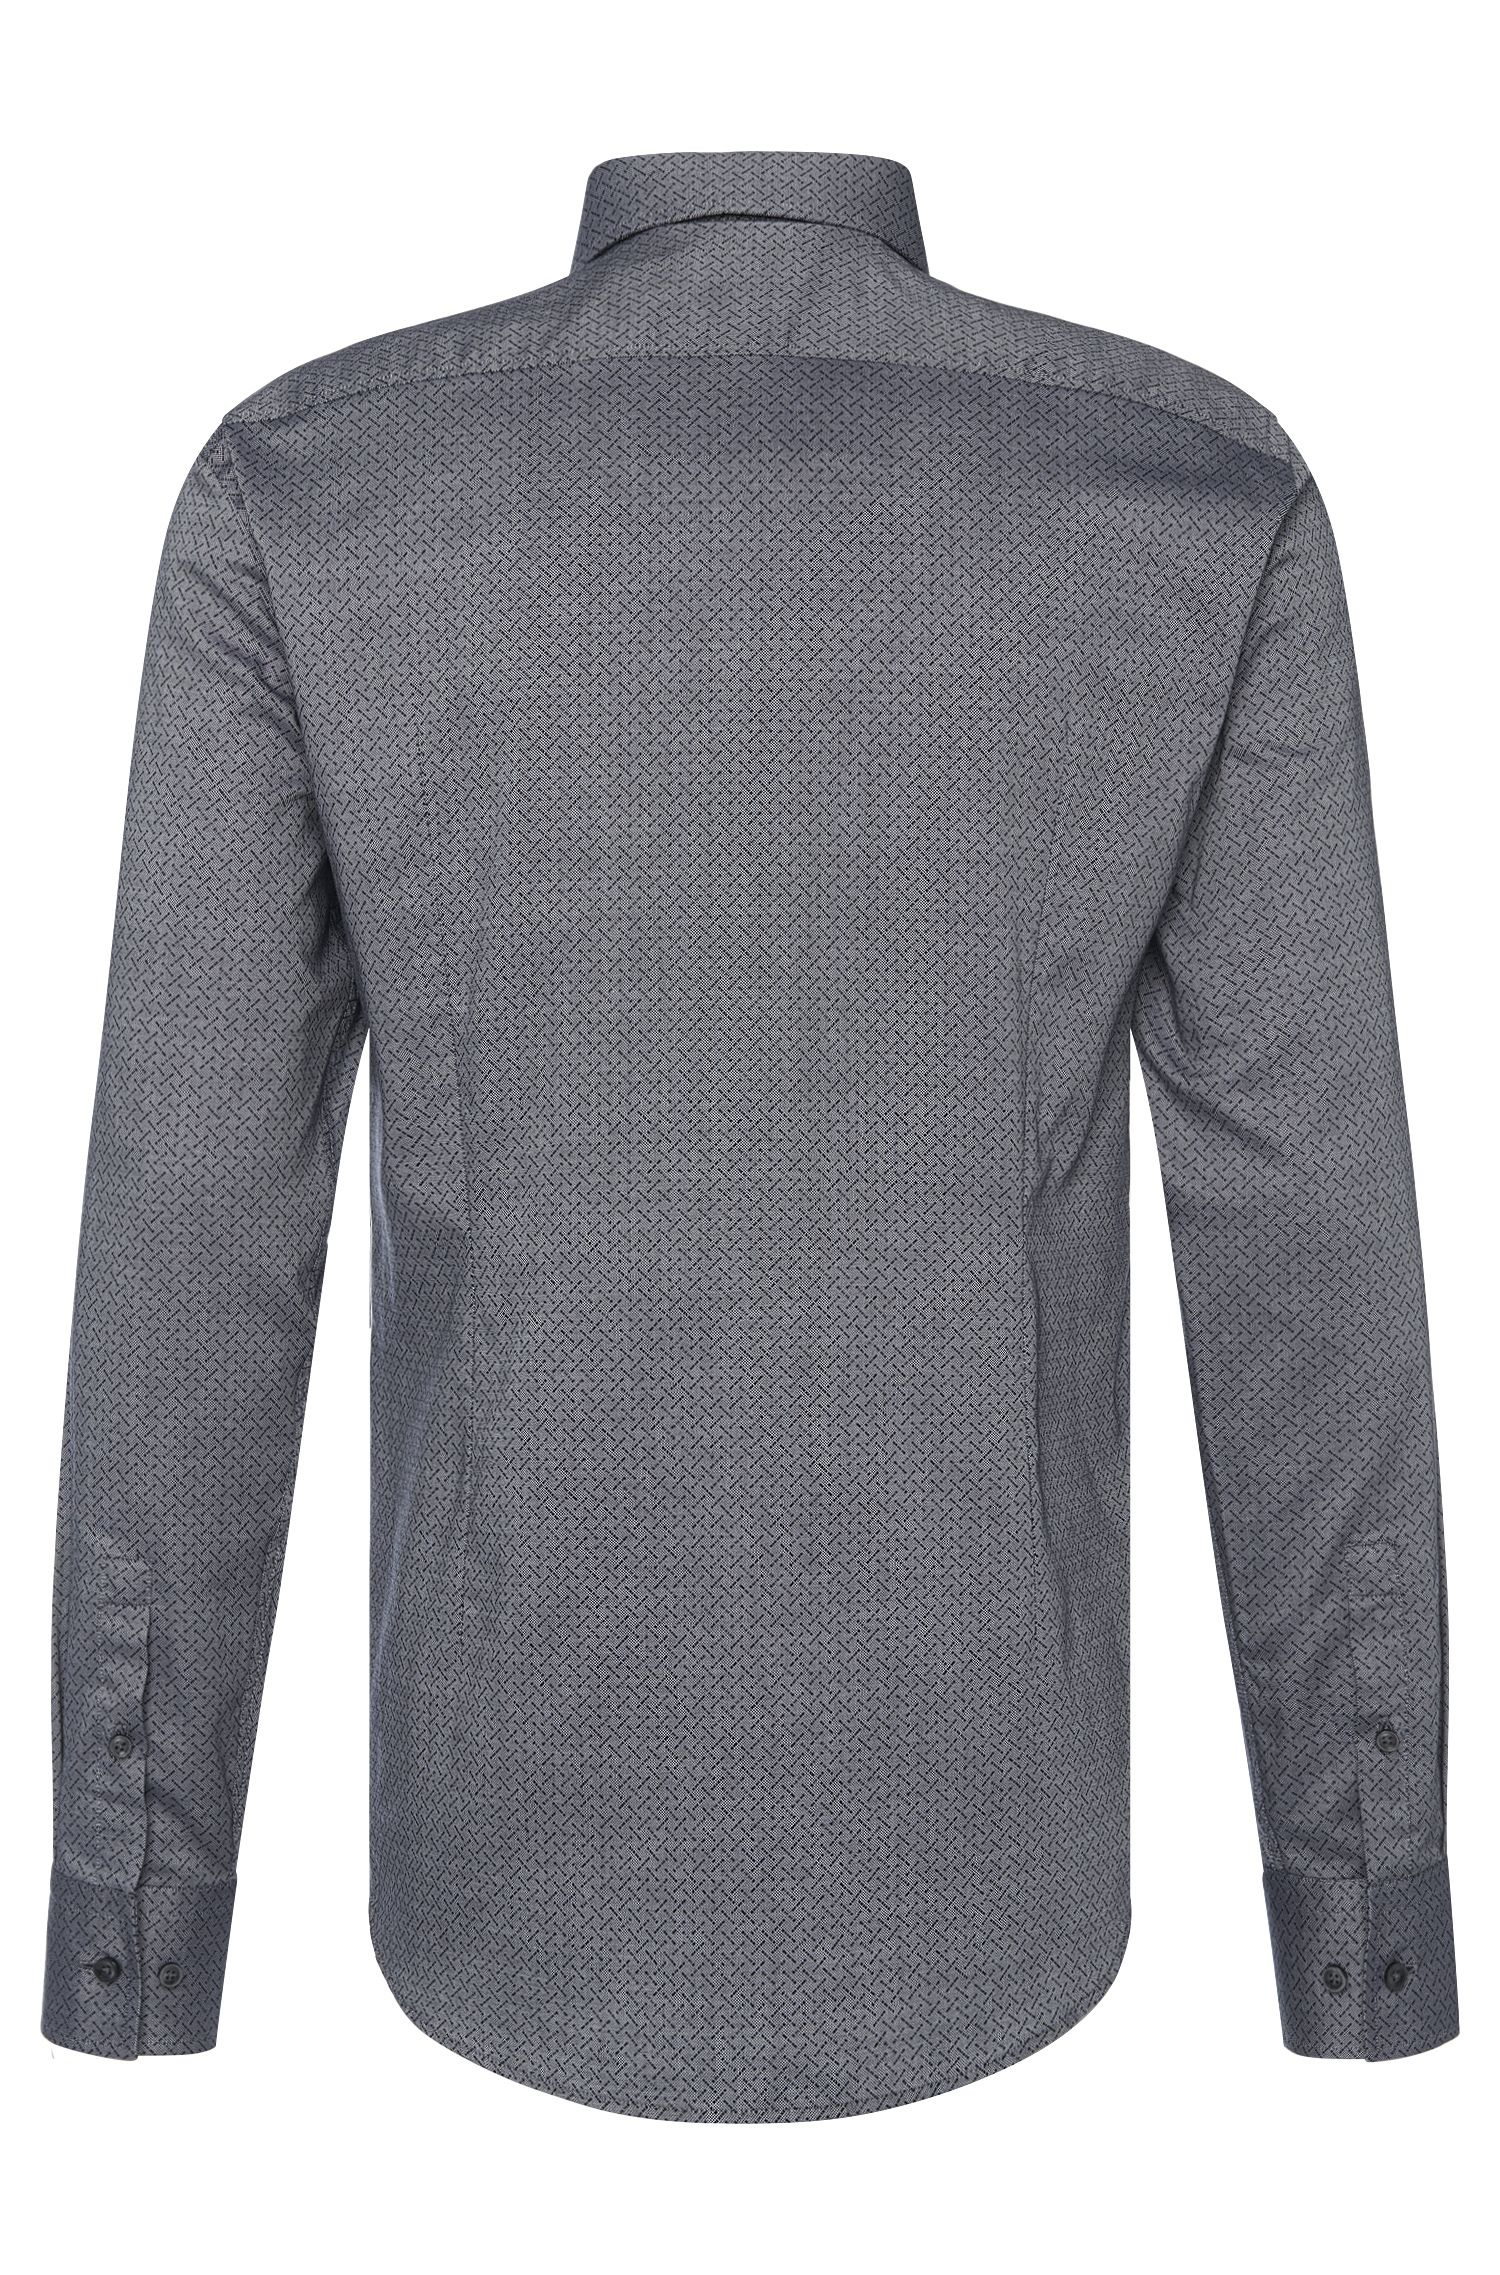 Gemustertes Slim-Fit Hemd aus Baumwolle: 'Jenno'